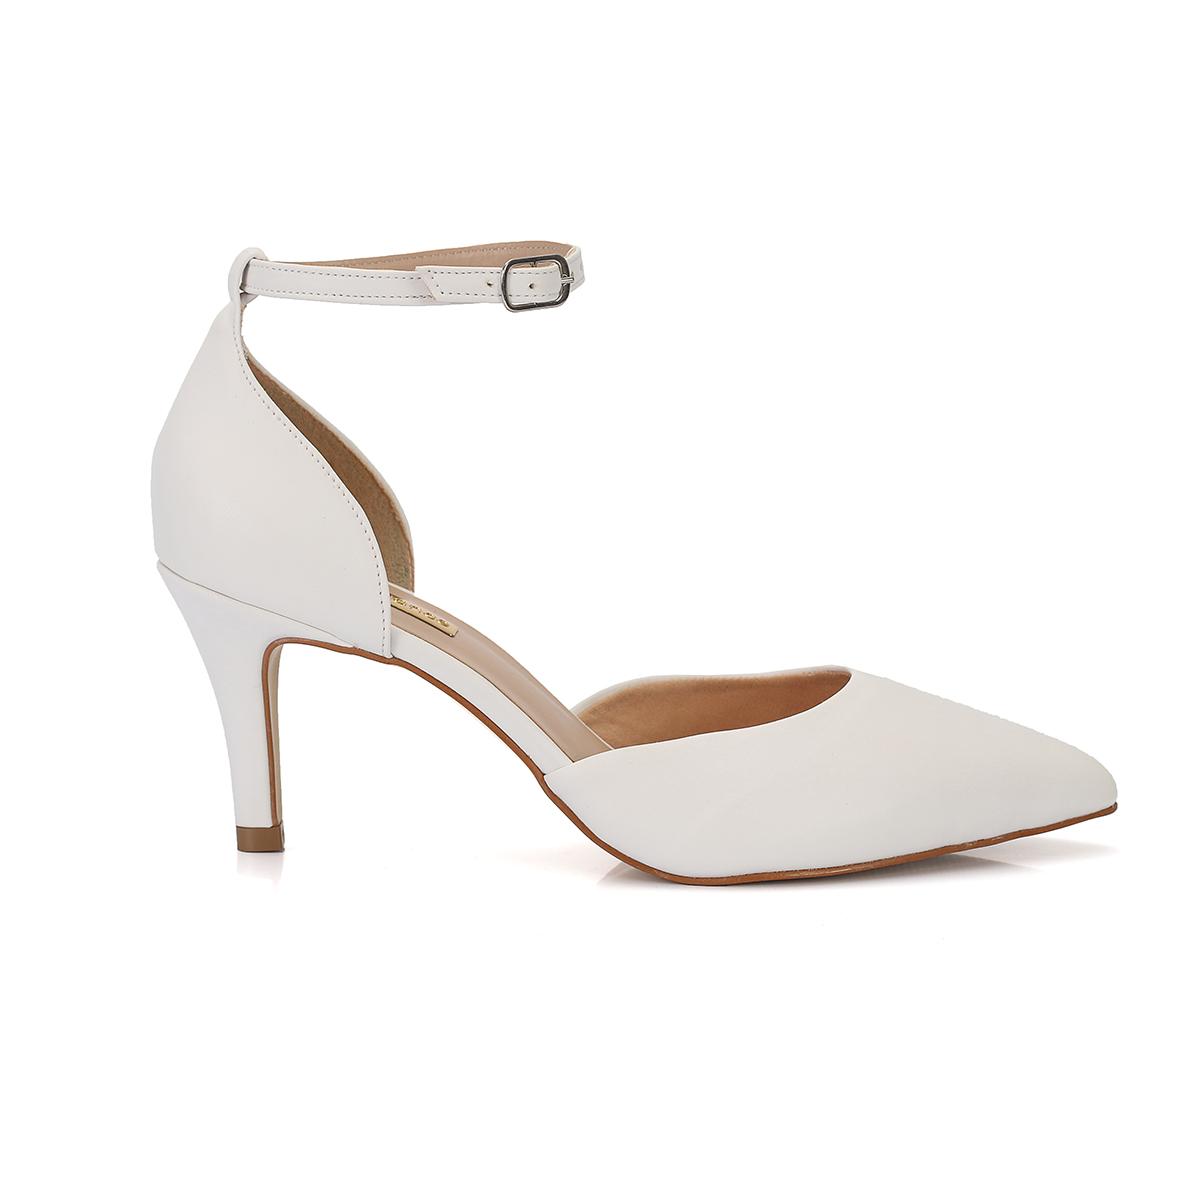 aefea745fb Scarpin Branco Salto médio New Elegance - New Elegance